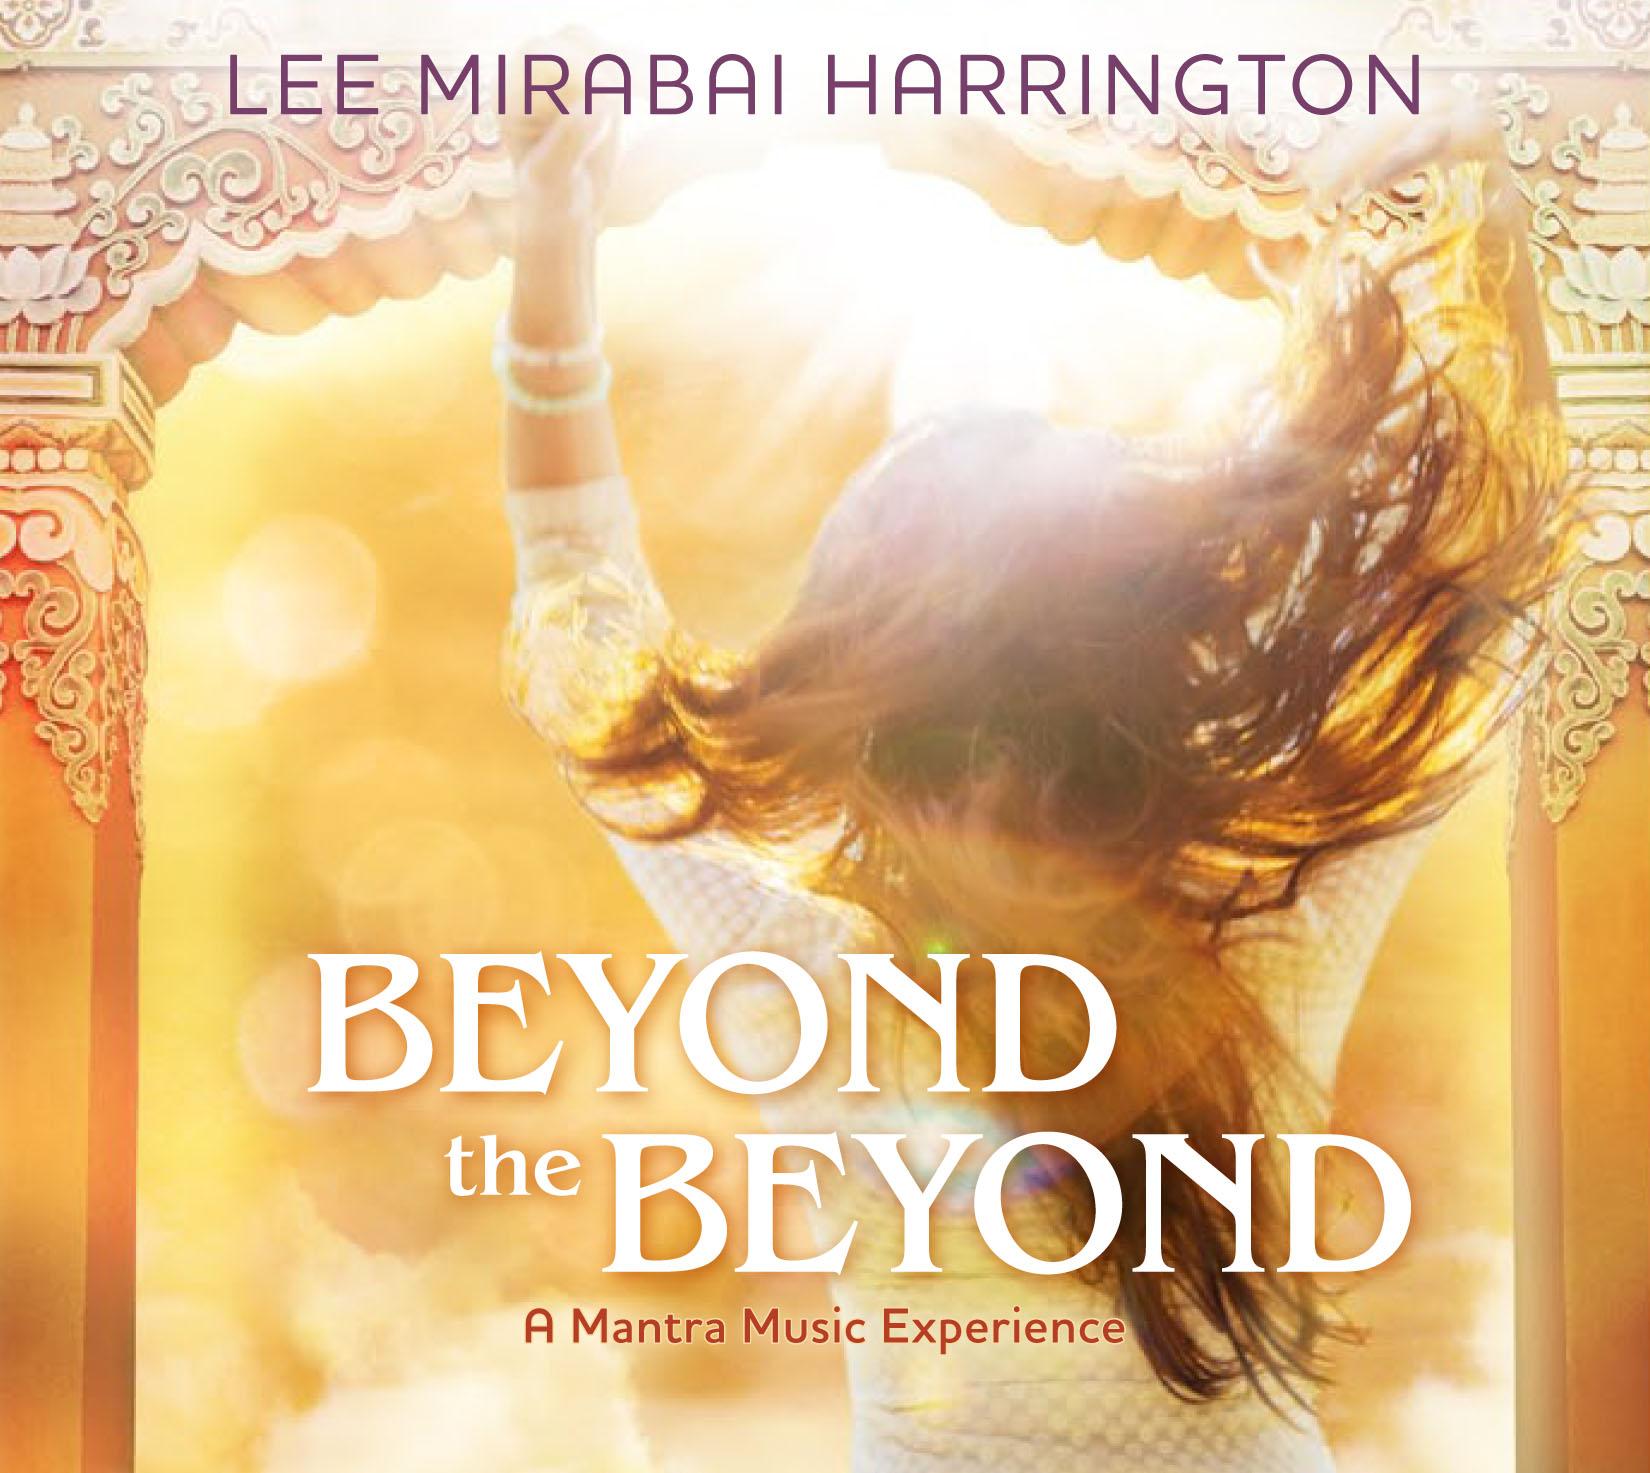 BeyondTheBeyond_AMantraMusicExDigitalBooklet_IGG_rev08-28-16 1